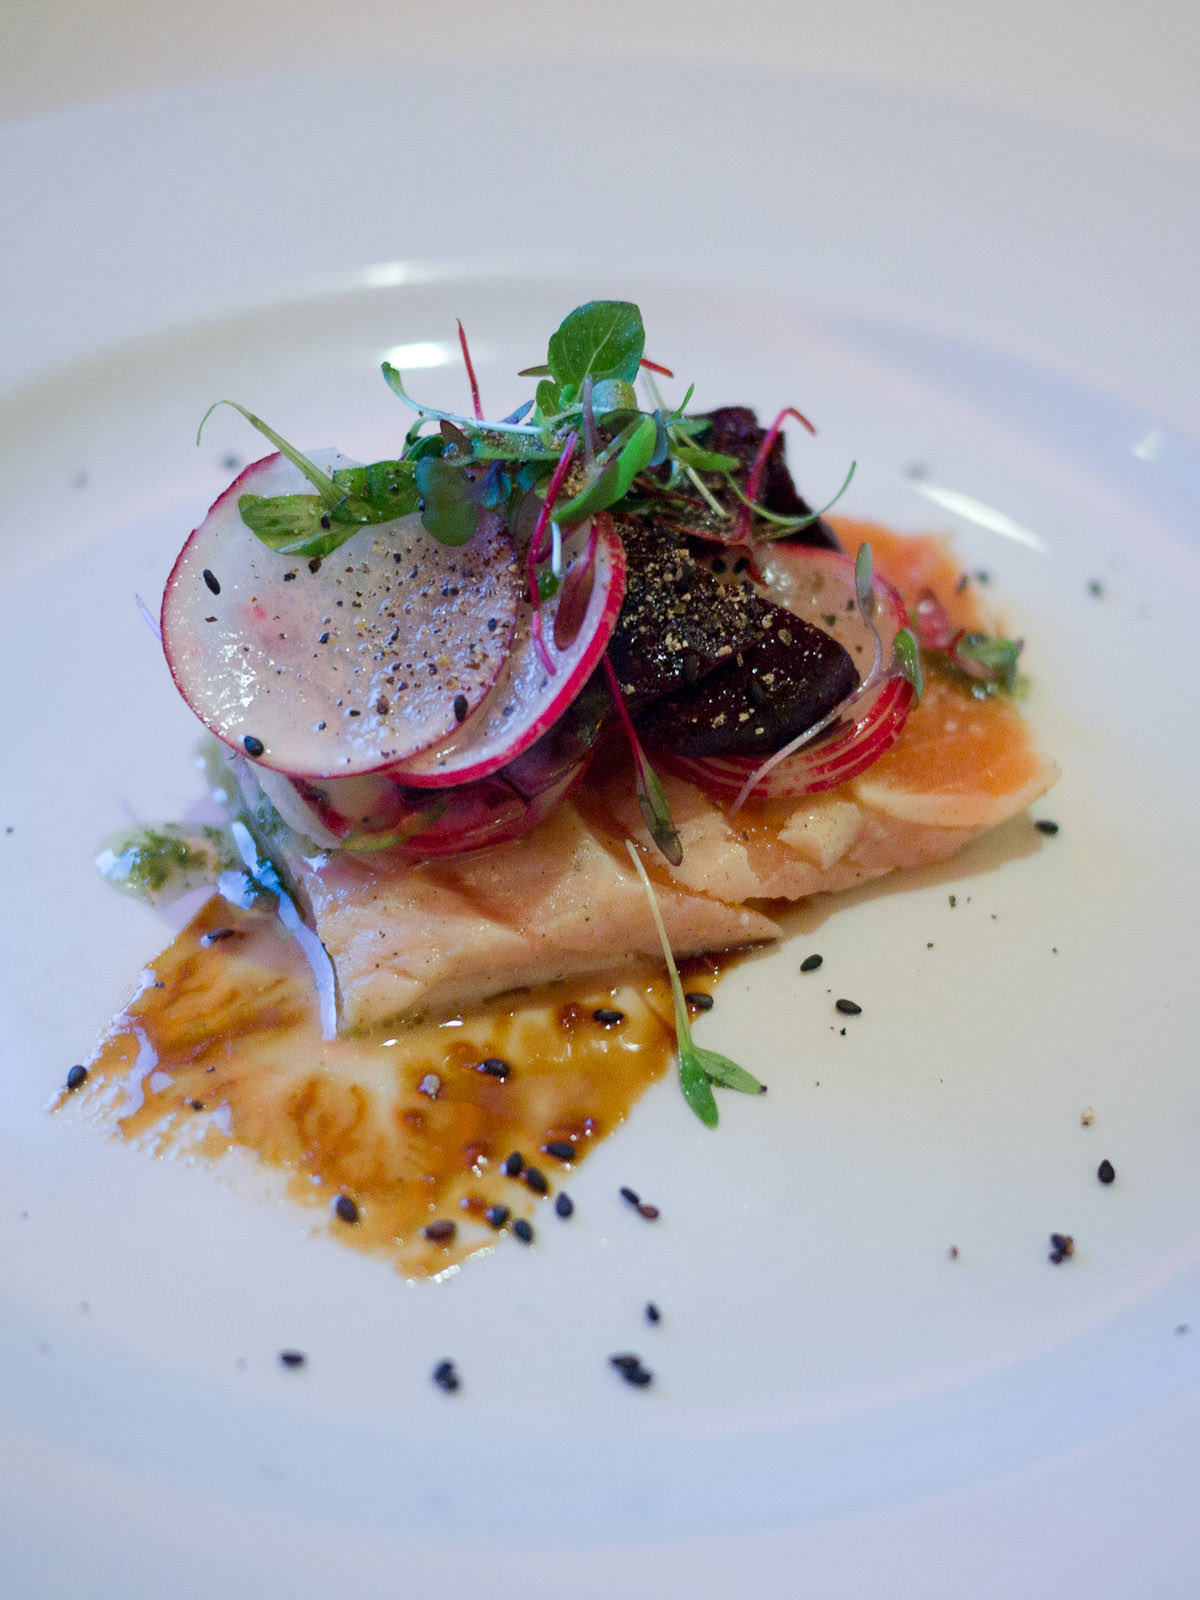 Tasmanian salmon tataki with root vegetable salad and jalapeno dressing